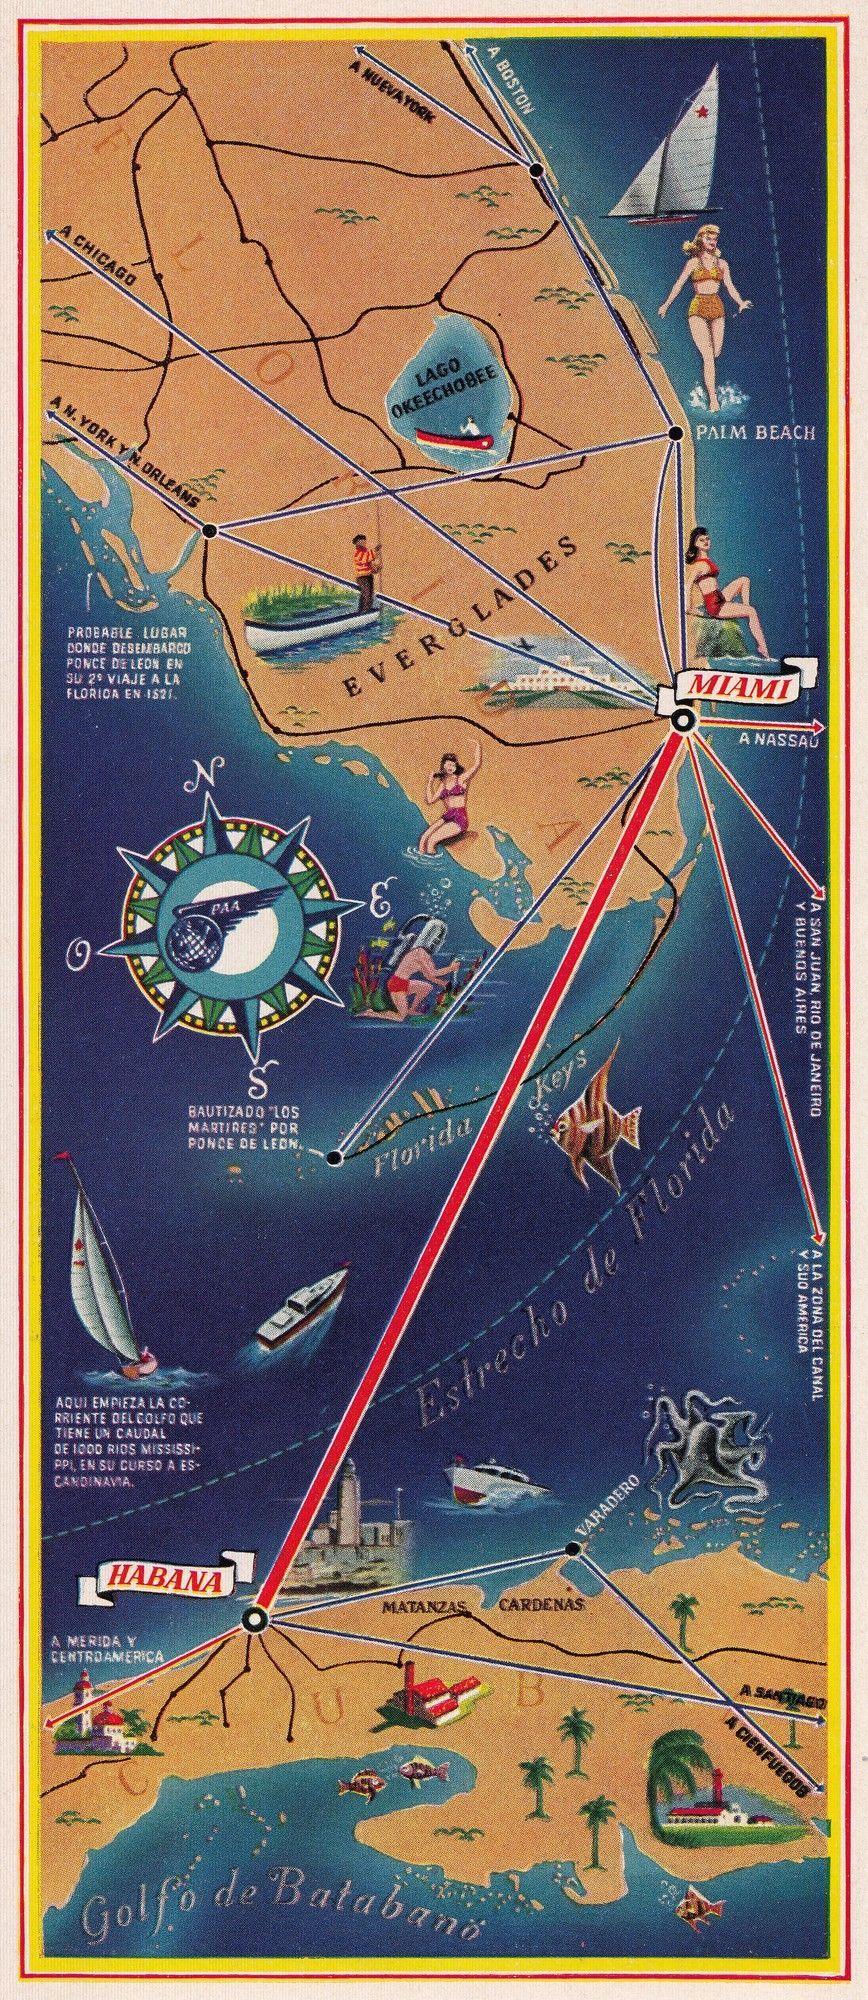 Havana Map Vertical Pan American Vintage Aviation Graphic Art On - Vintage aviation maps